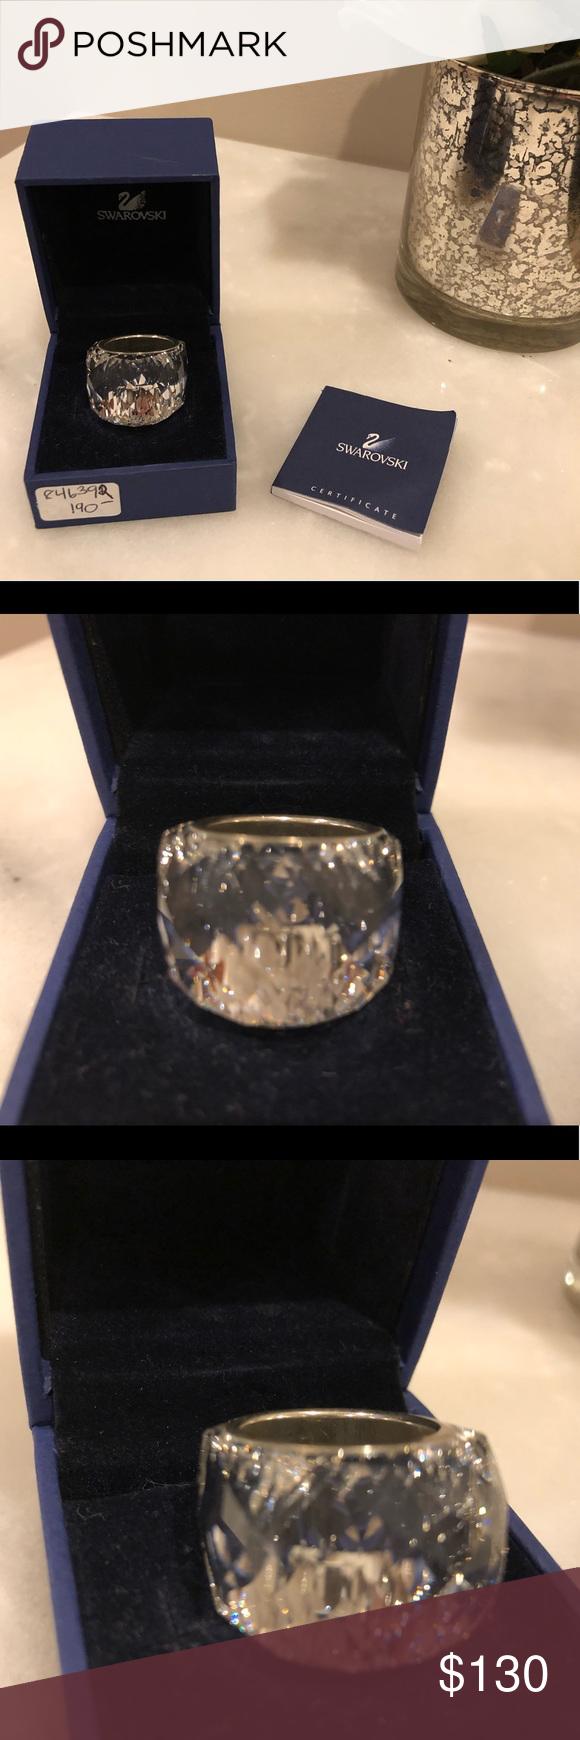 af8c27ede EUC- Swarovski Nirvana Crystal Ring Size 7 EUC- Swarovski Nirvana Crystal Ring  Size 55 (7). STUNNING statement piece. Comes in original box with  certificate ...